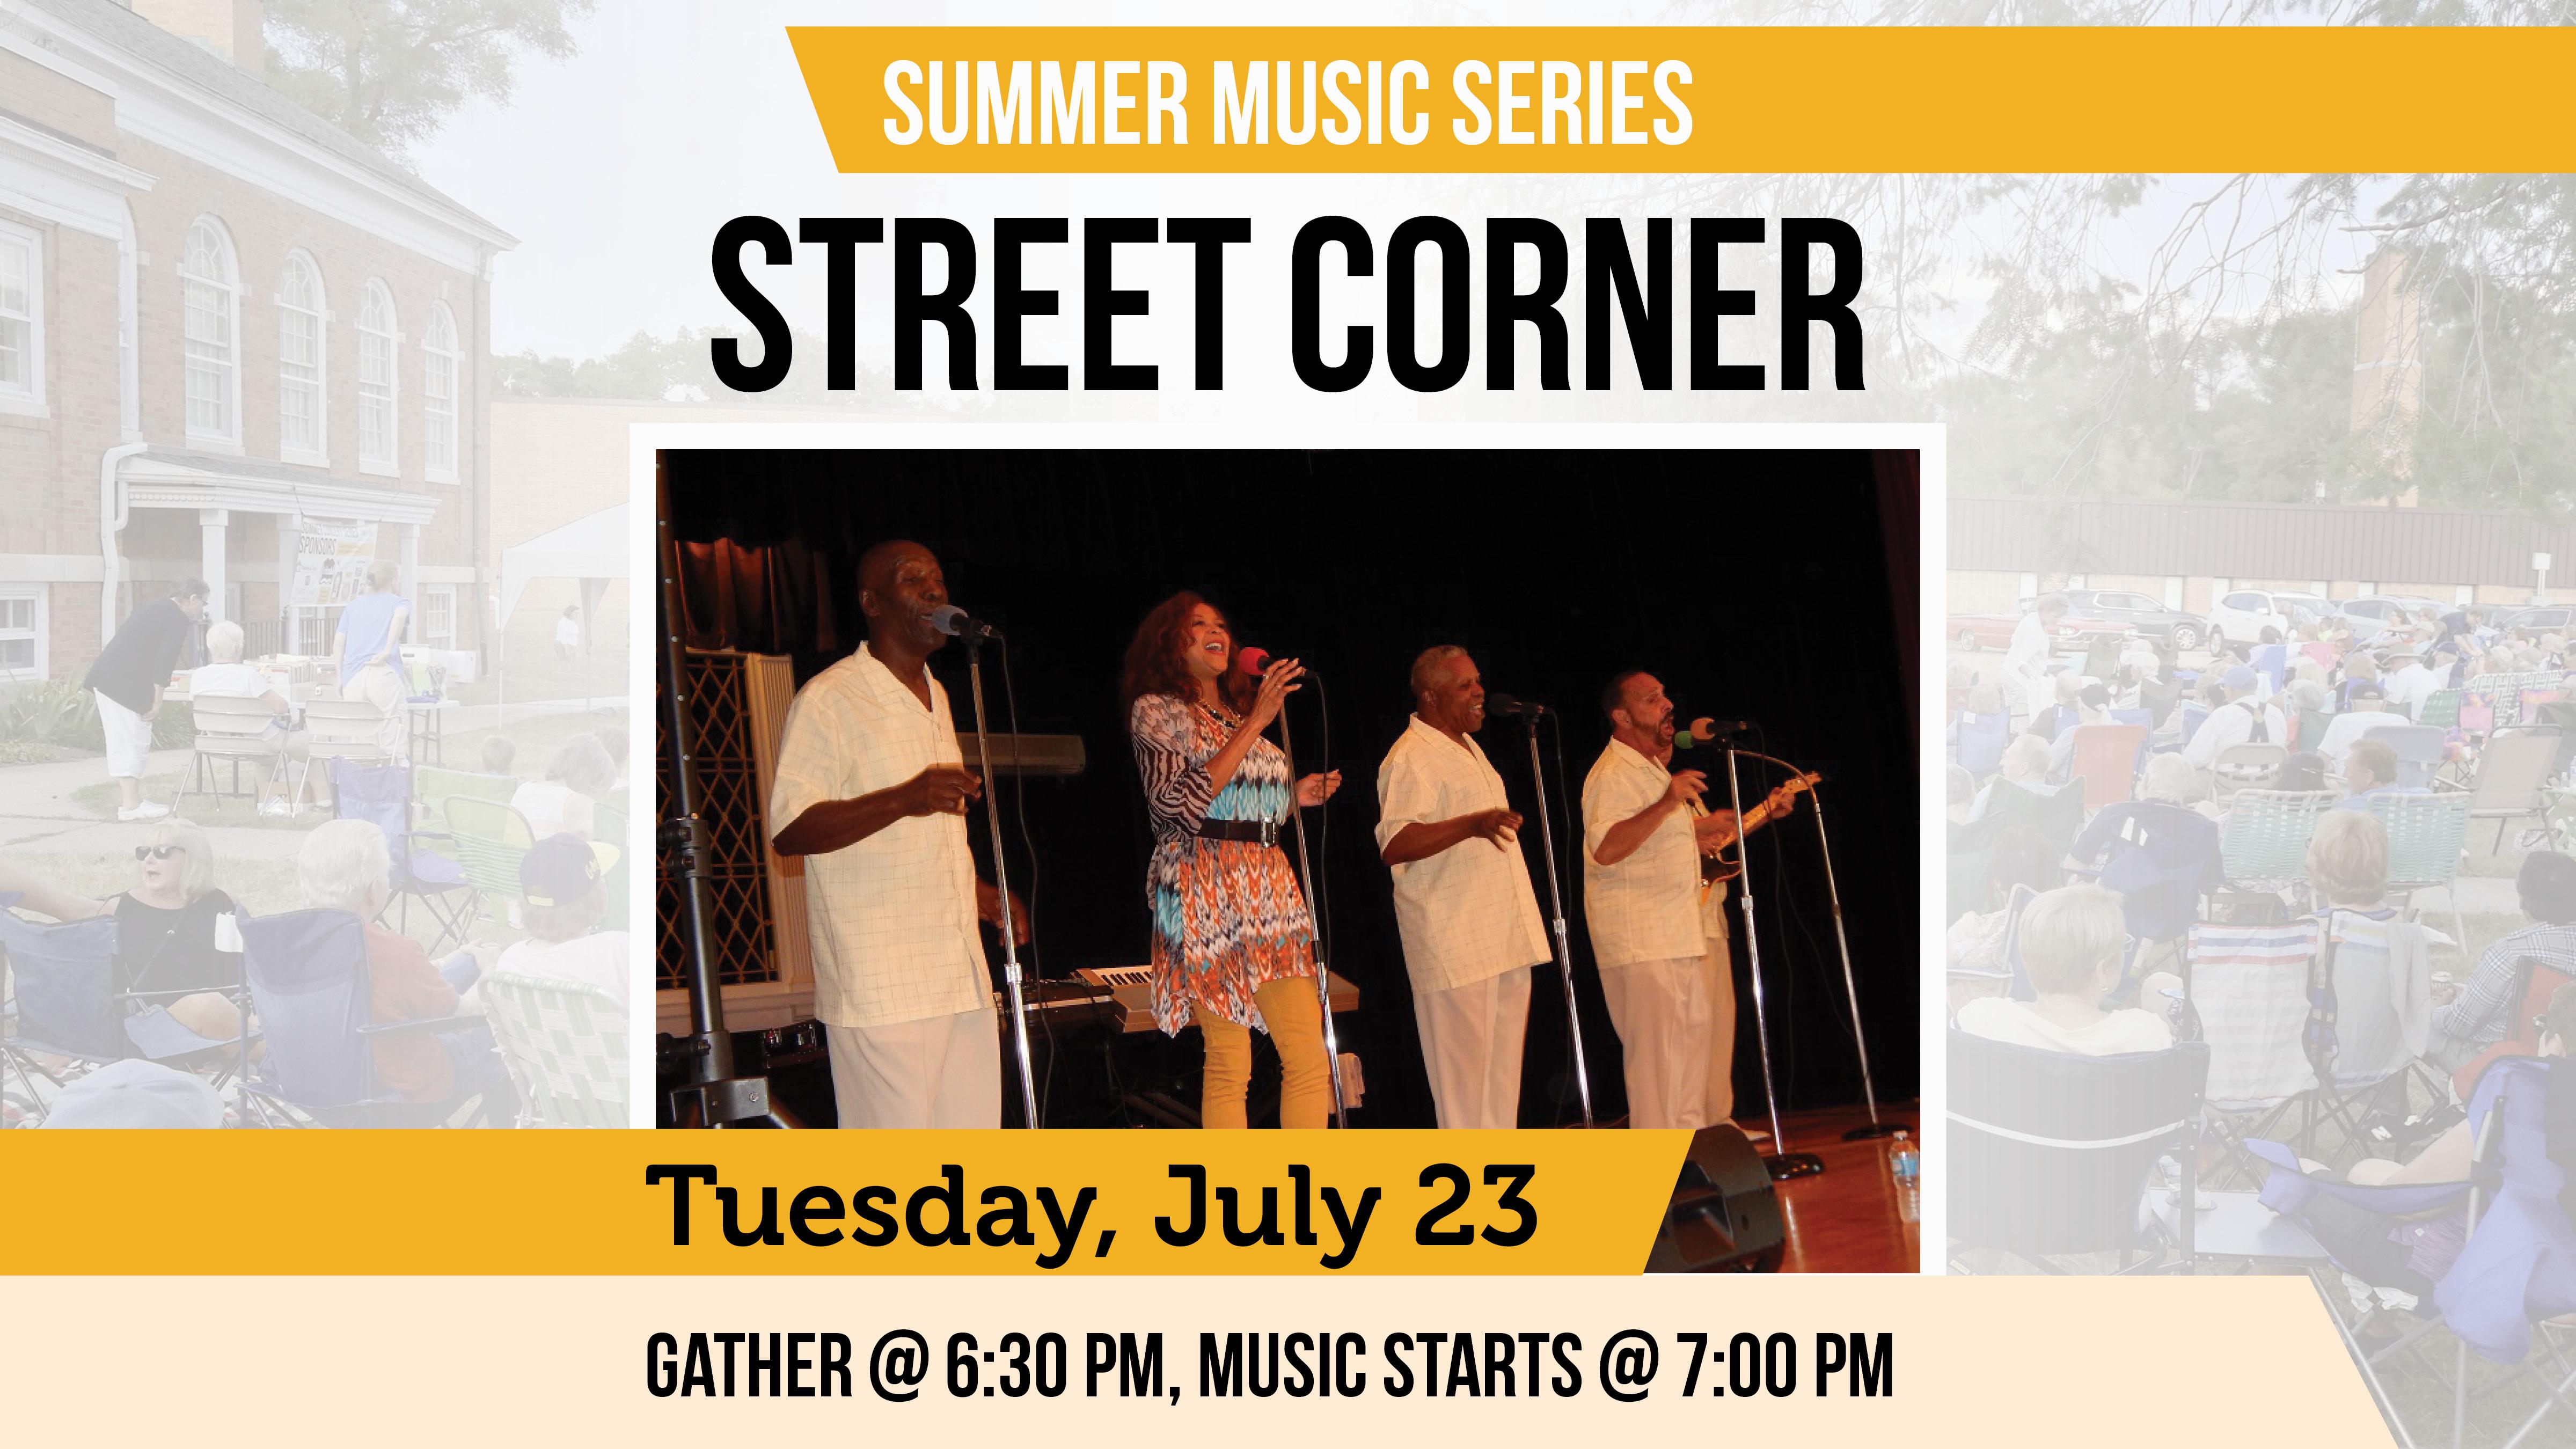 Cromaine Summer Music Series on Tuesday Nights